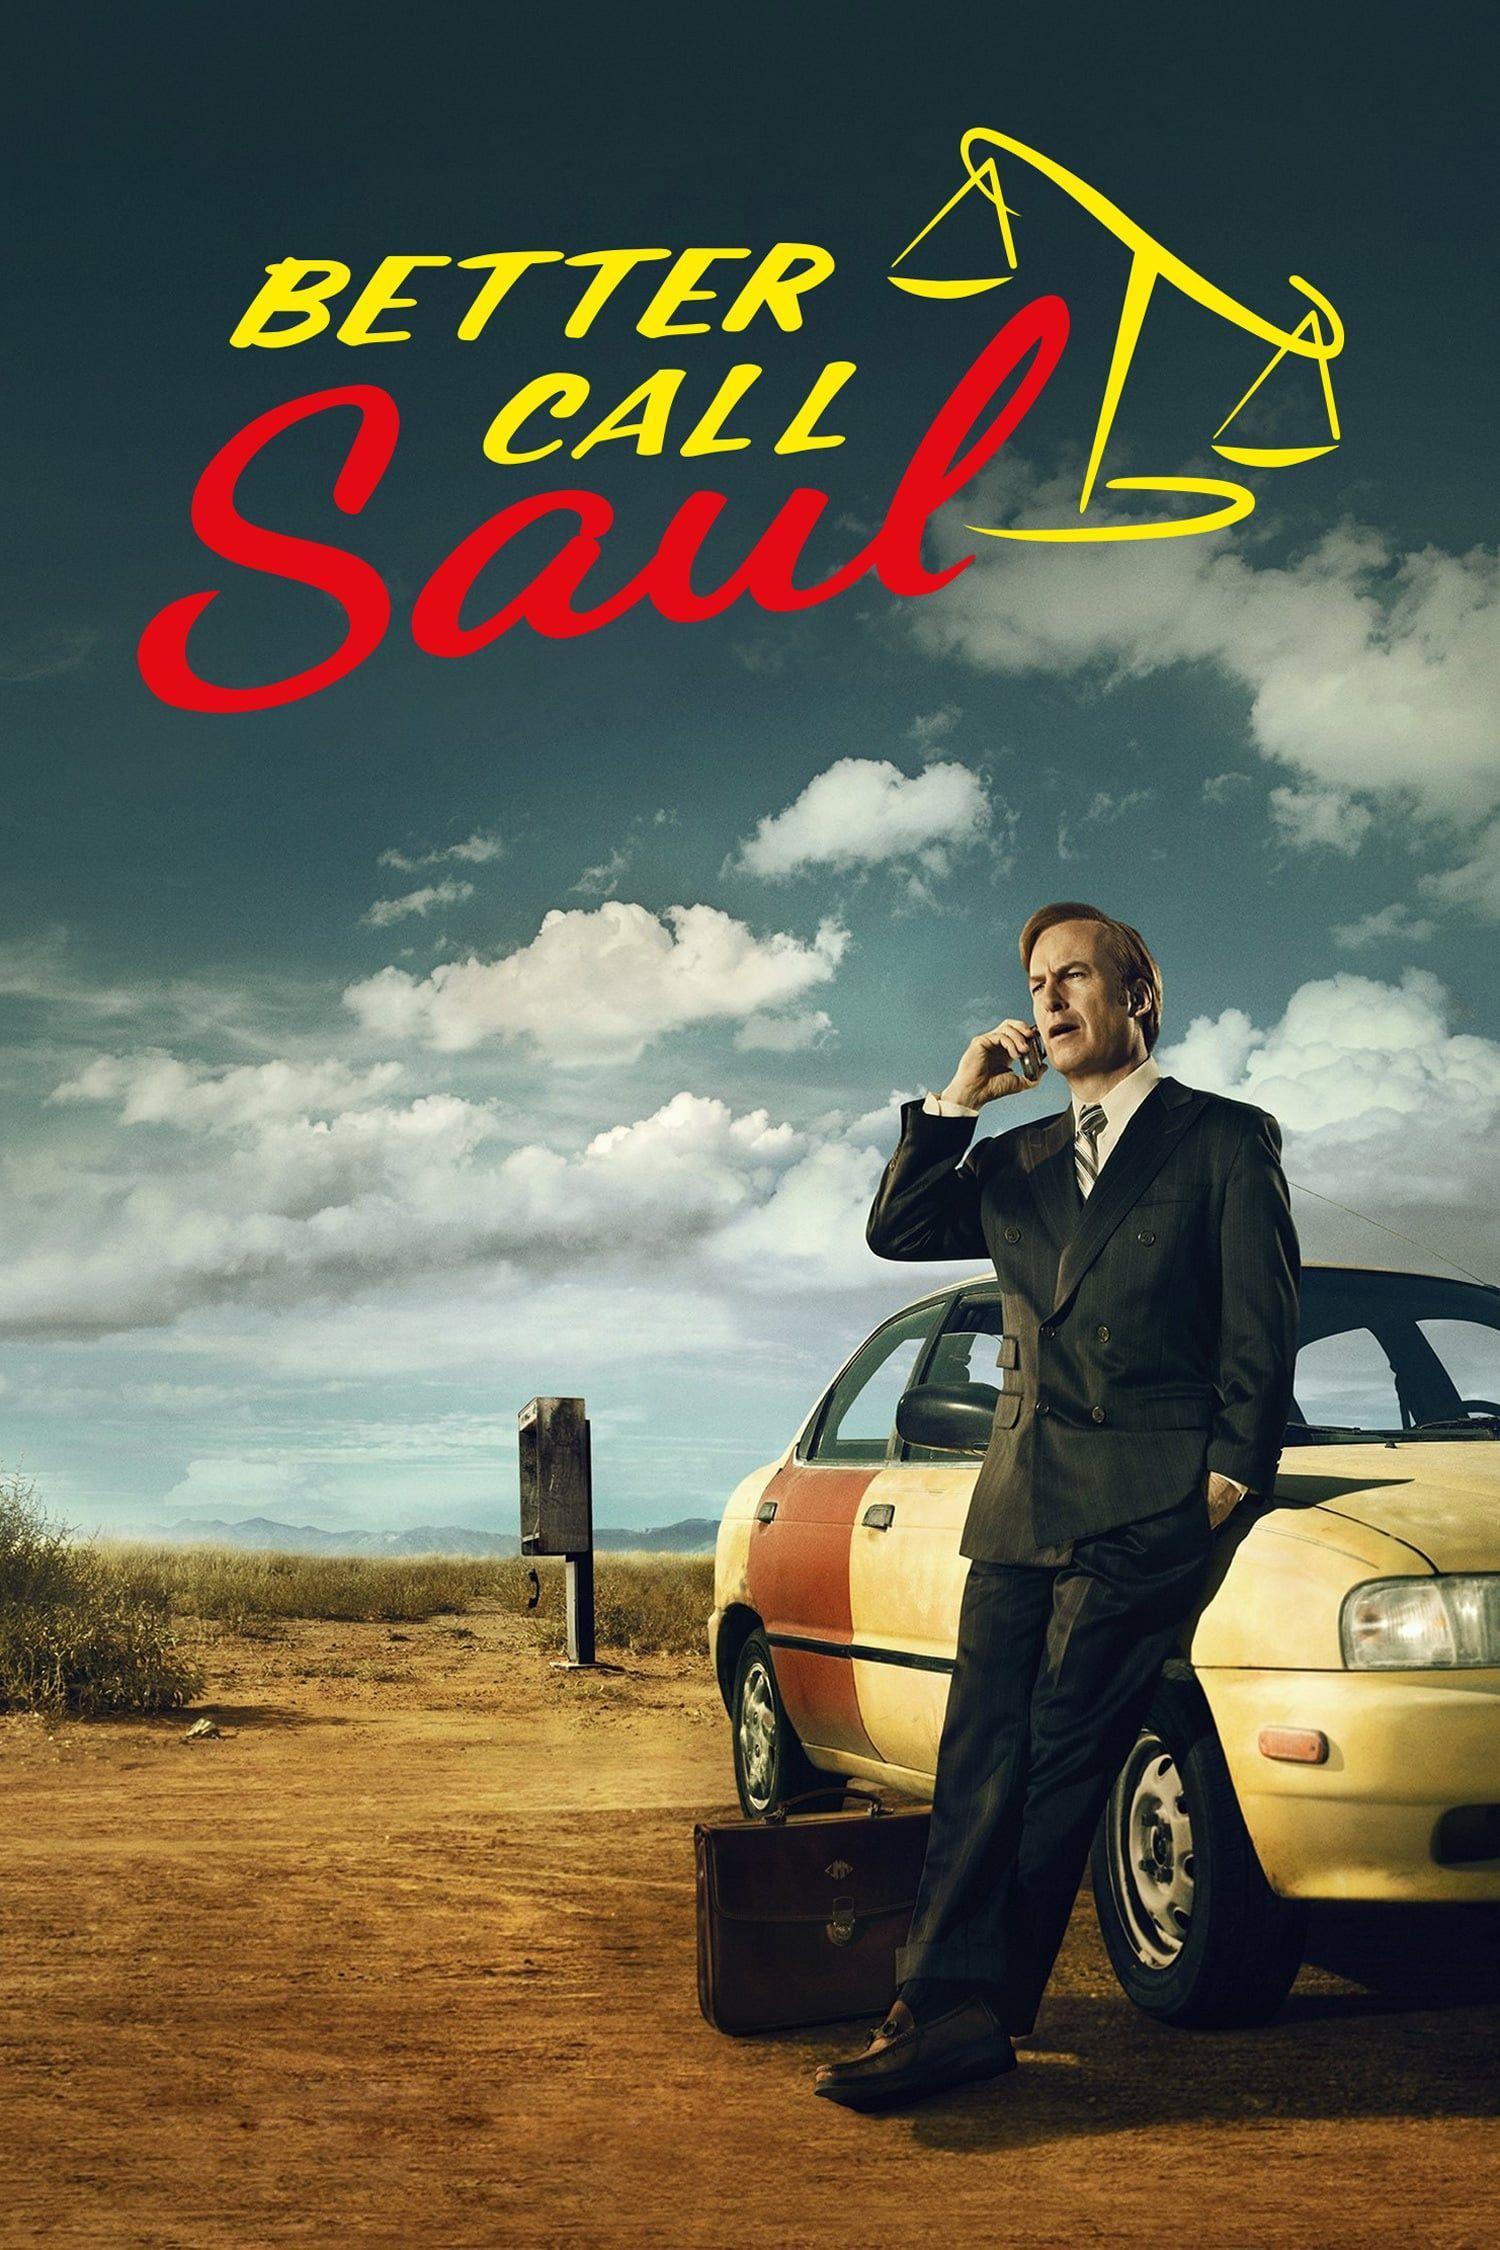 better call saul season 1 episode 1 online free